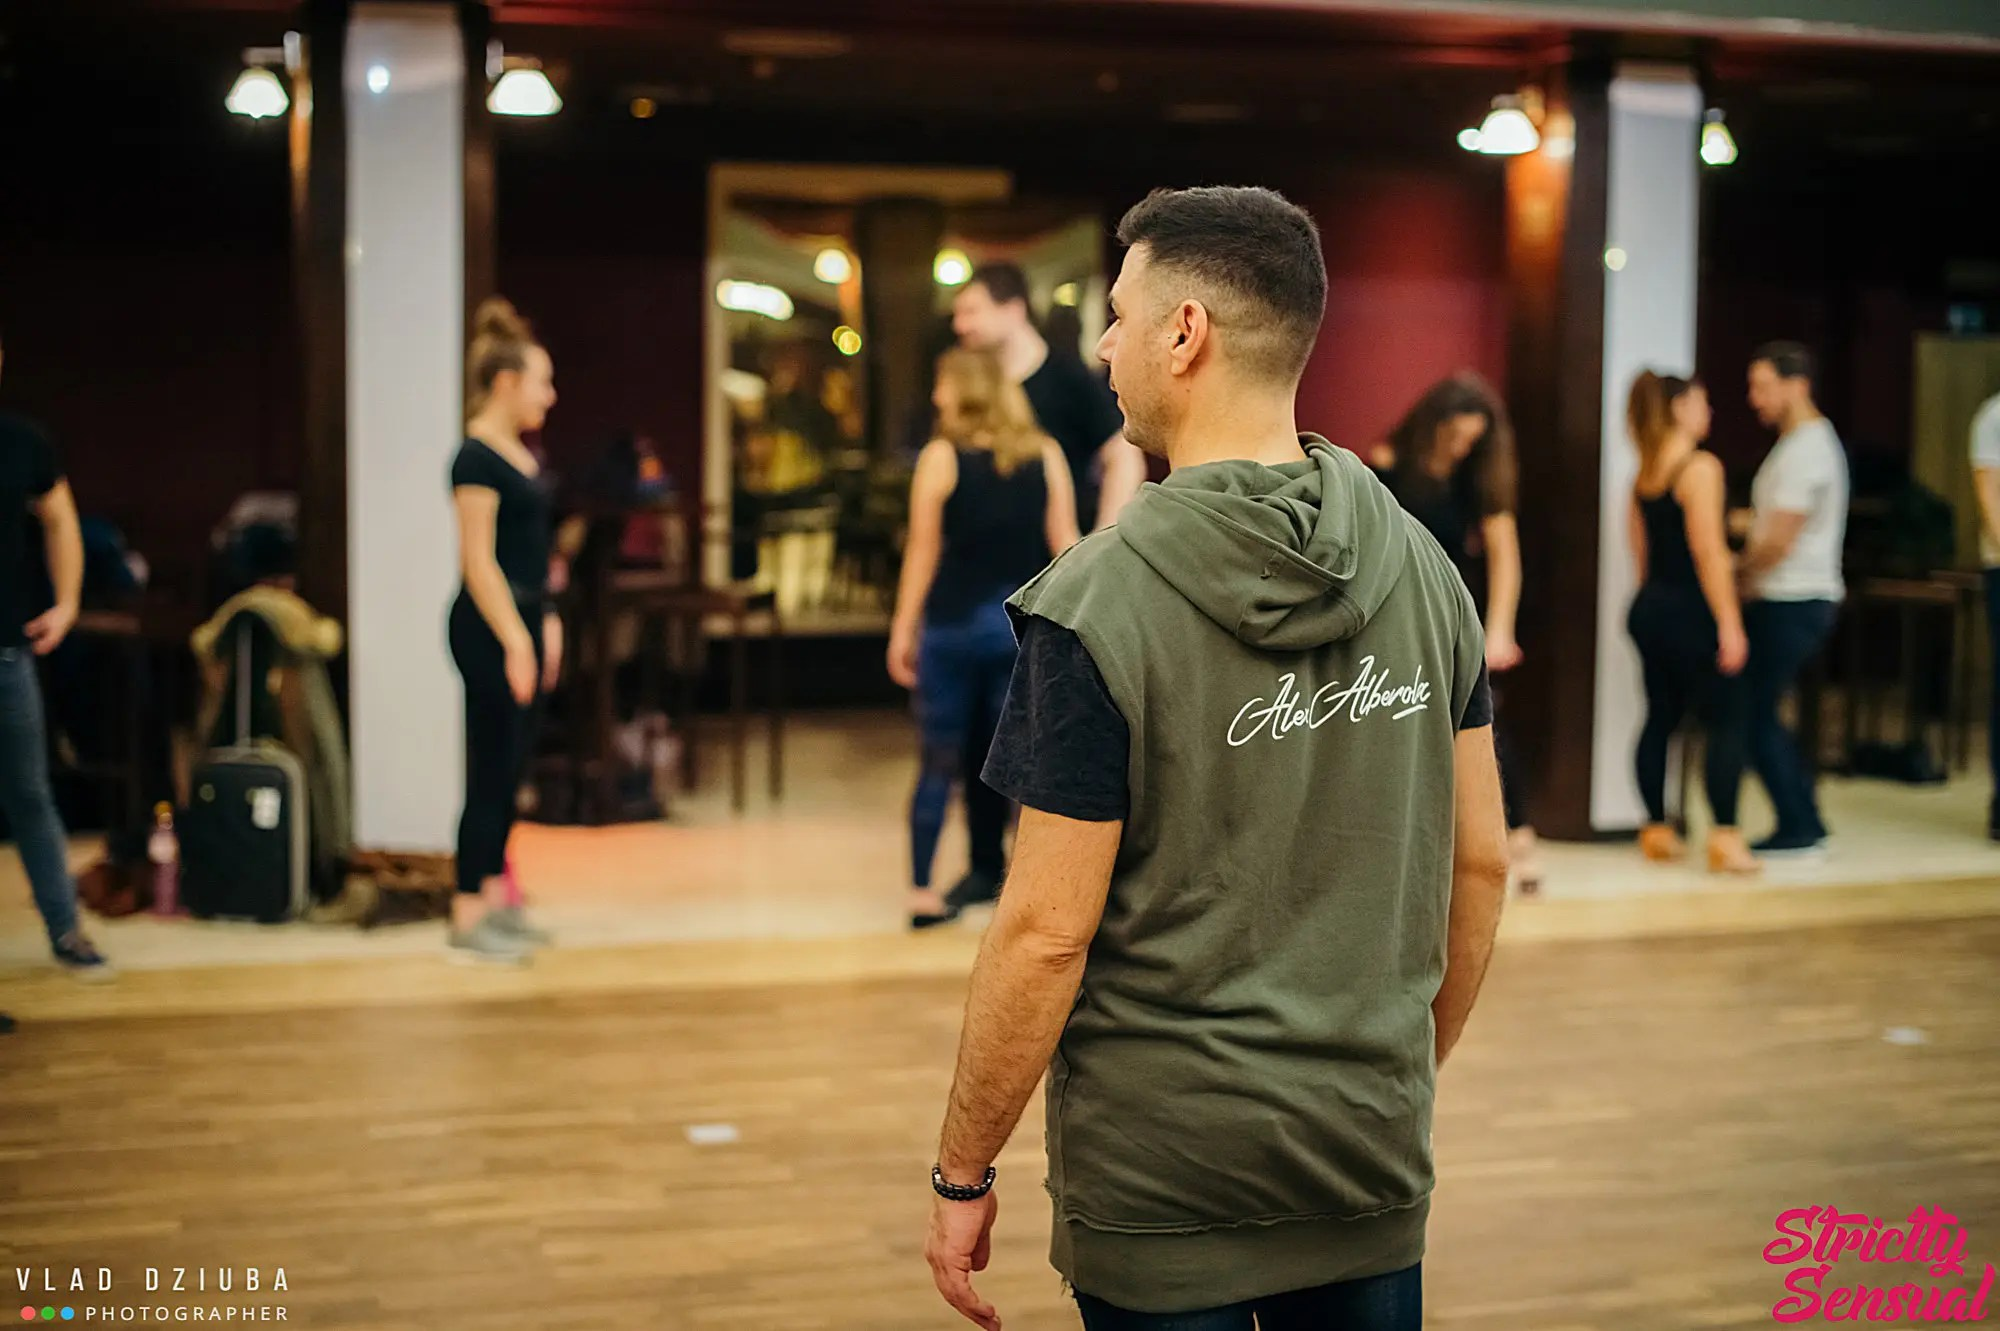 Alex Alberola teaching during a workshop - Let's Dance Bachata